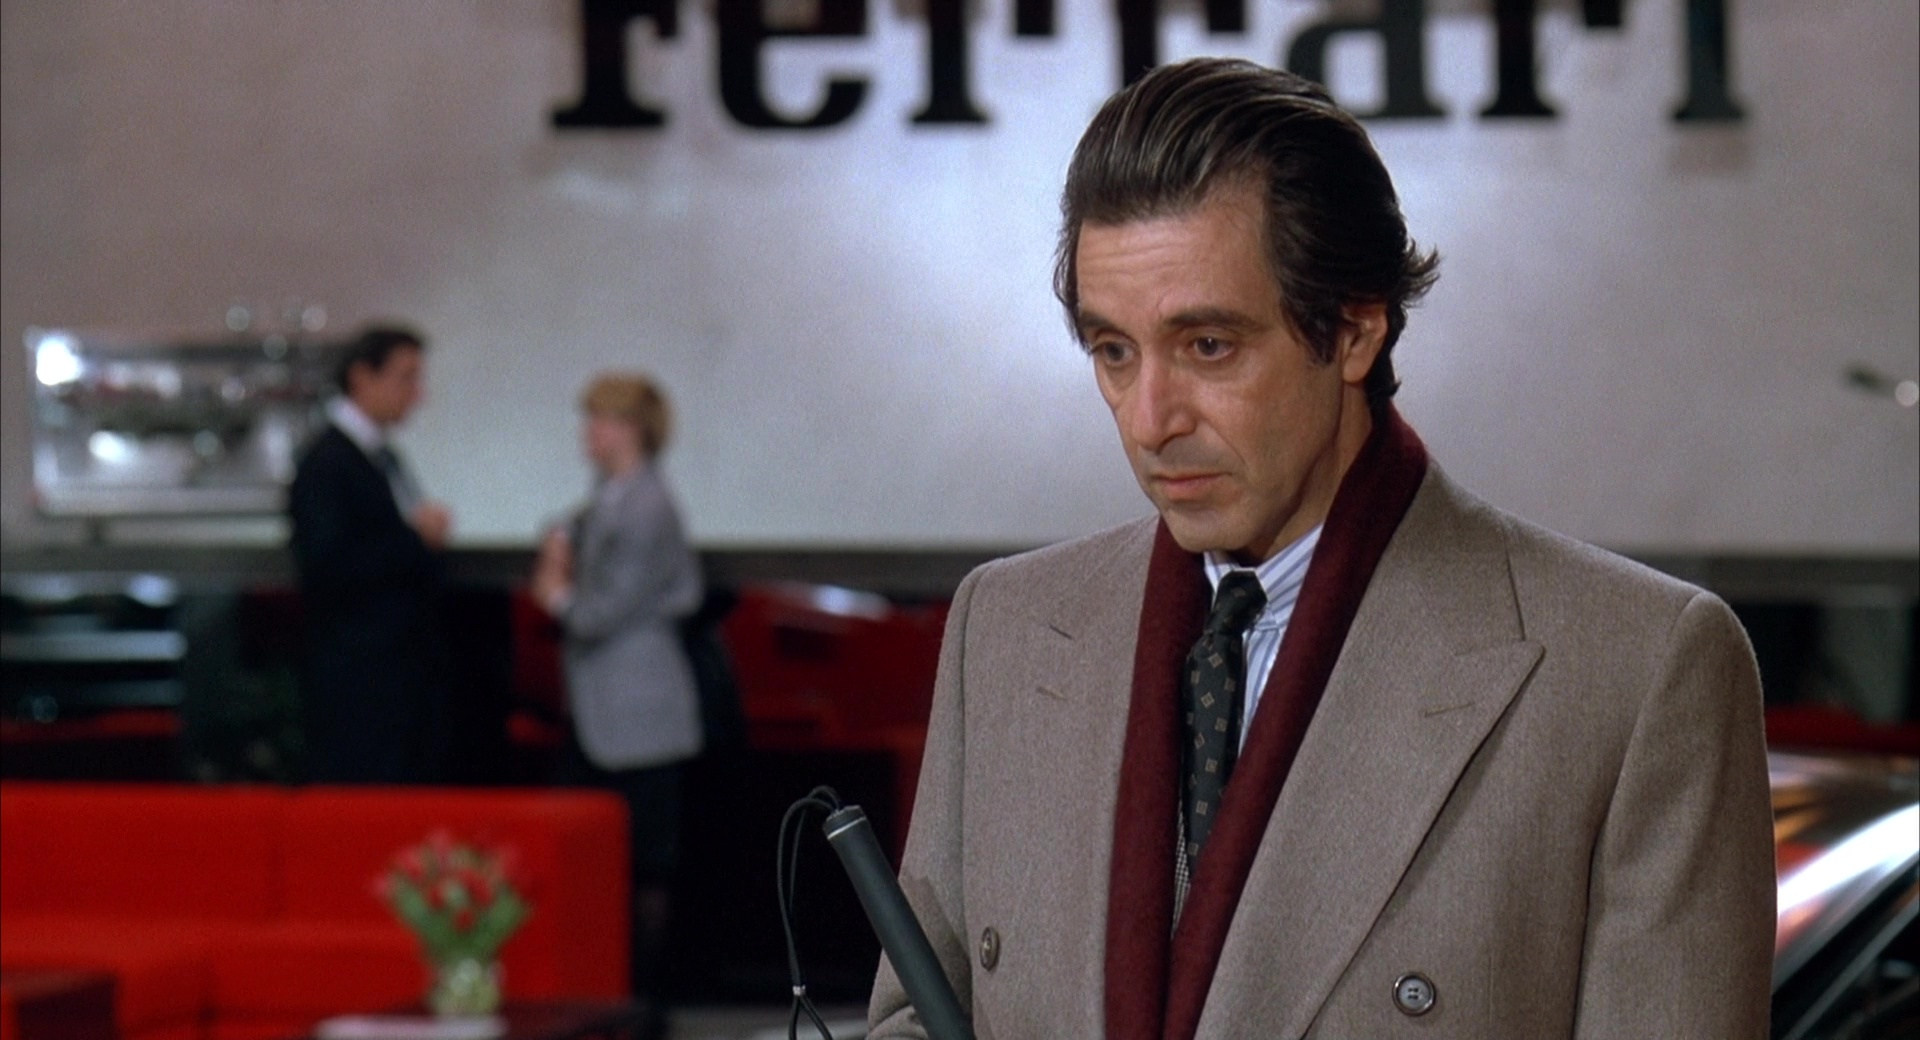 Ferrari Car Dealer Chris O Donnell And Al Pacino In